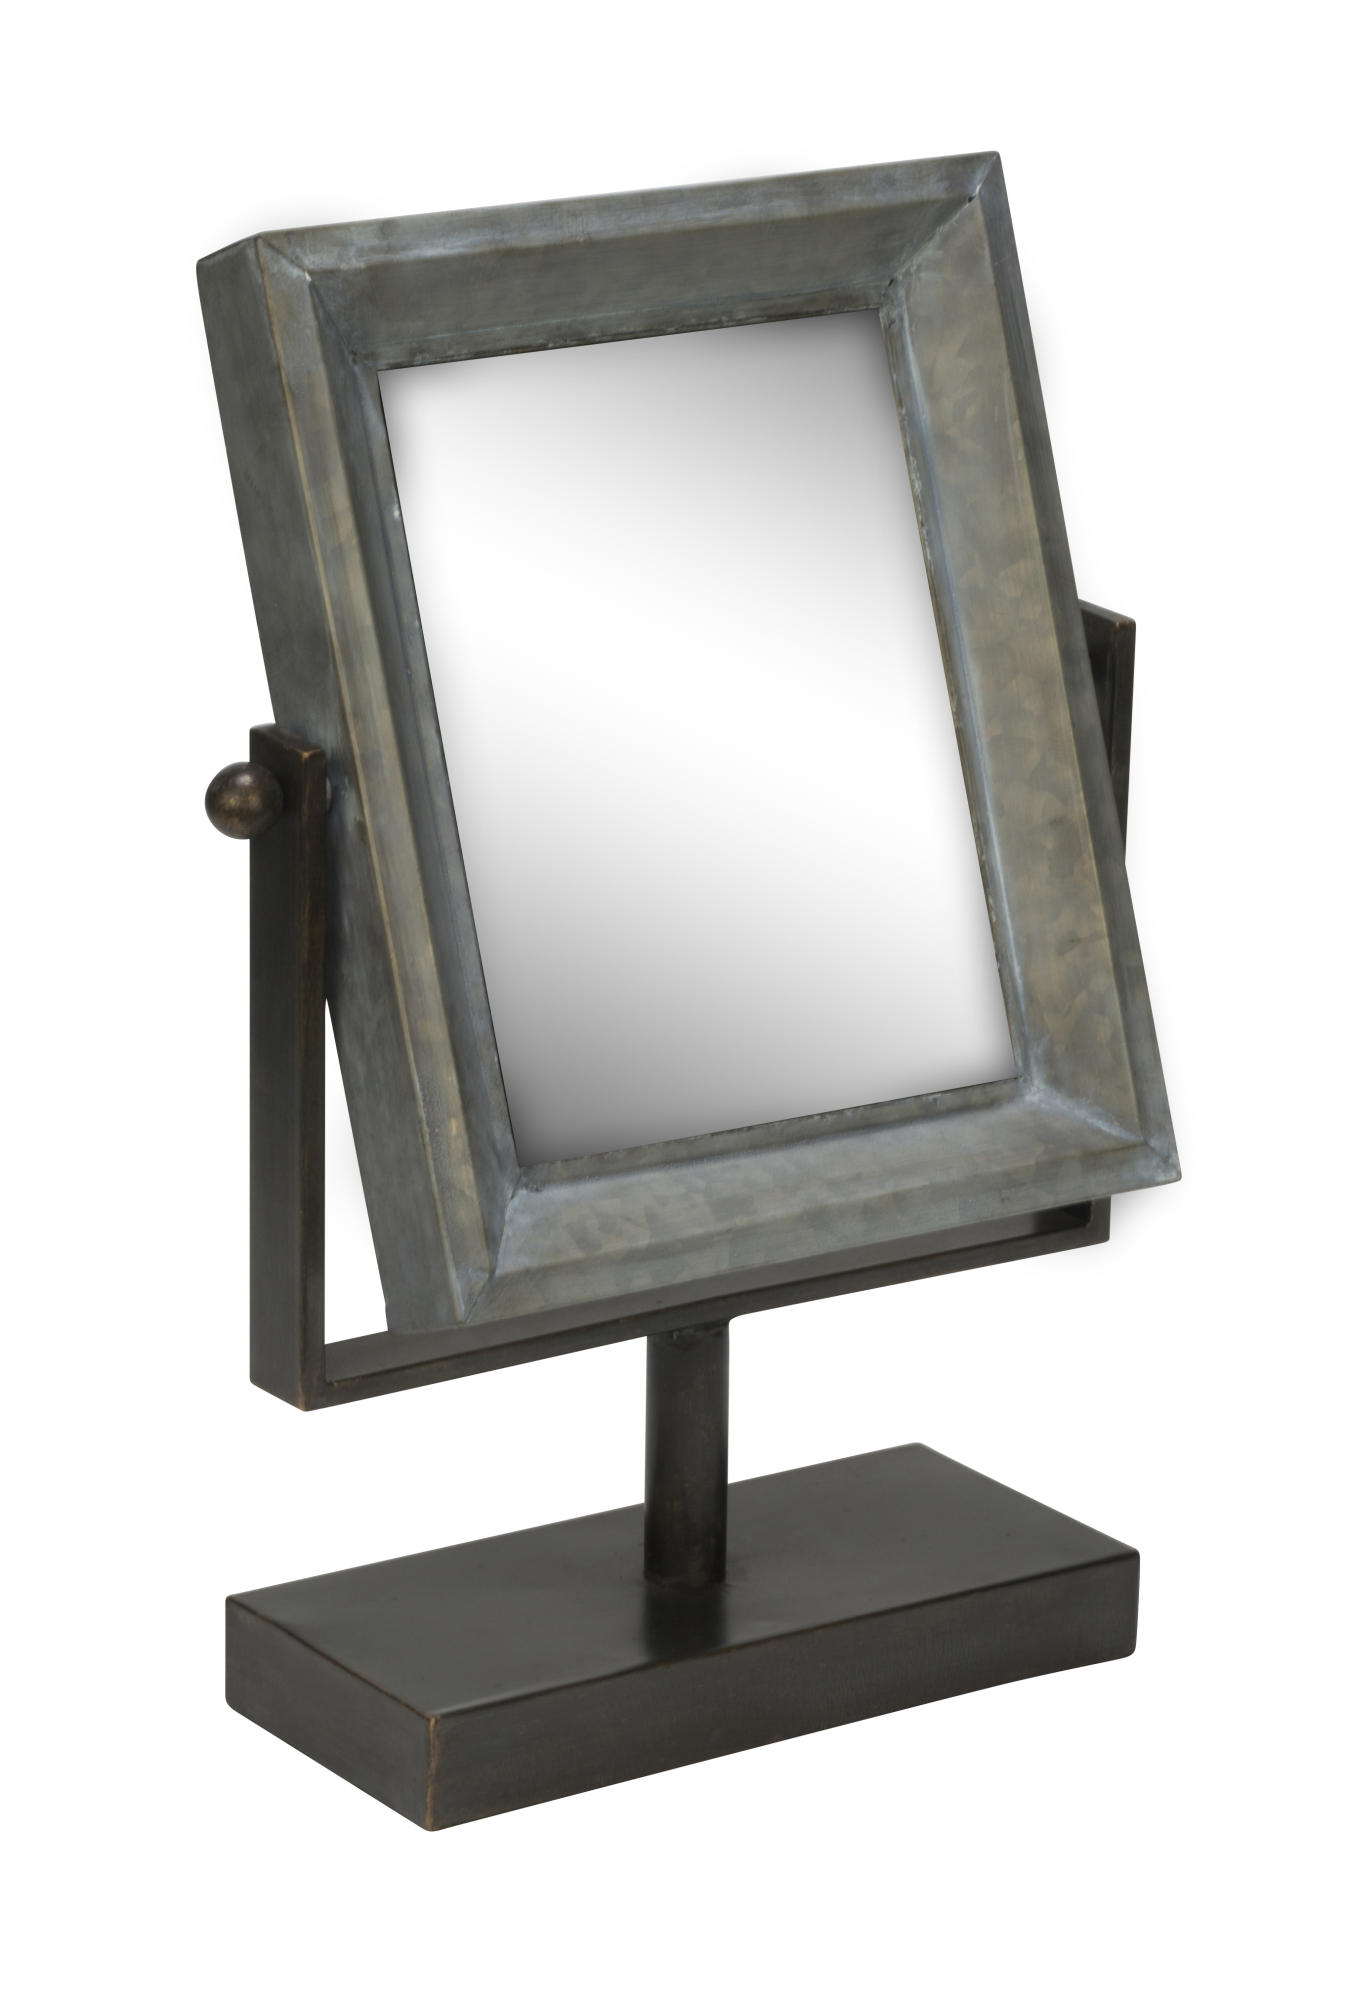 Tin Frame Table Top Mirror